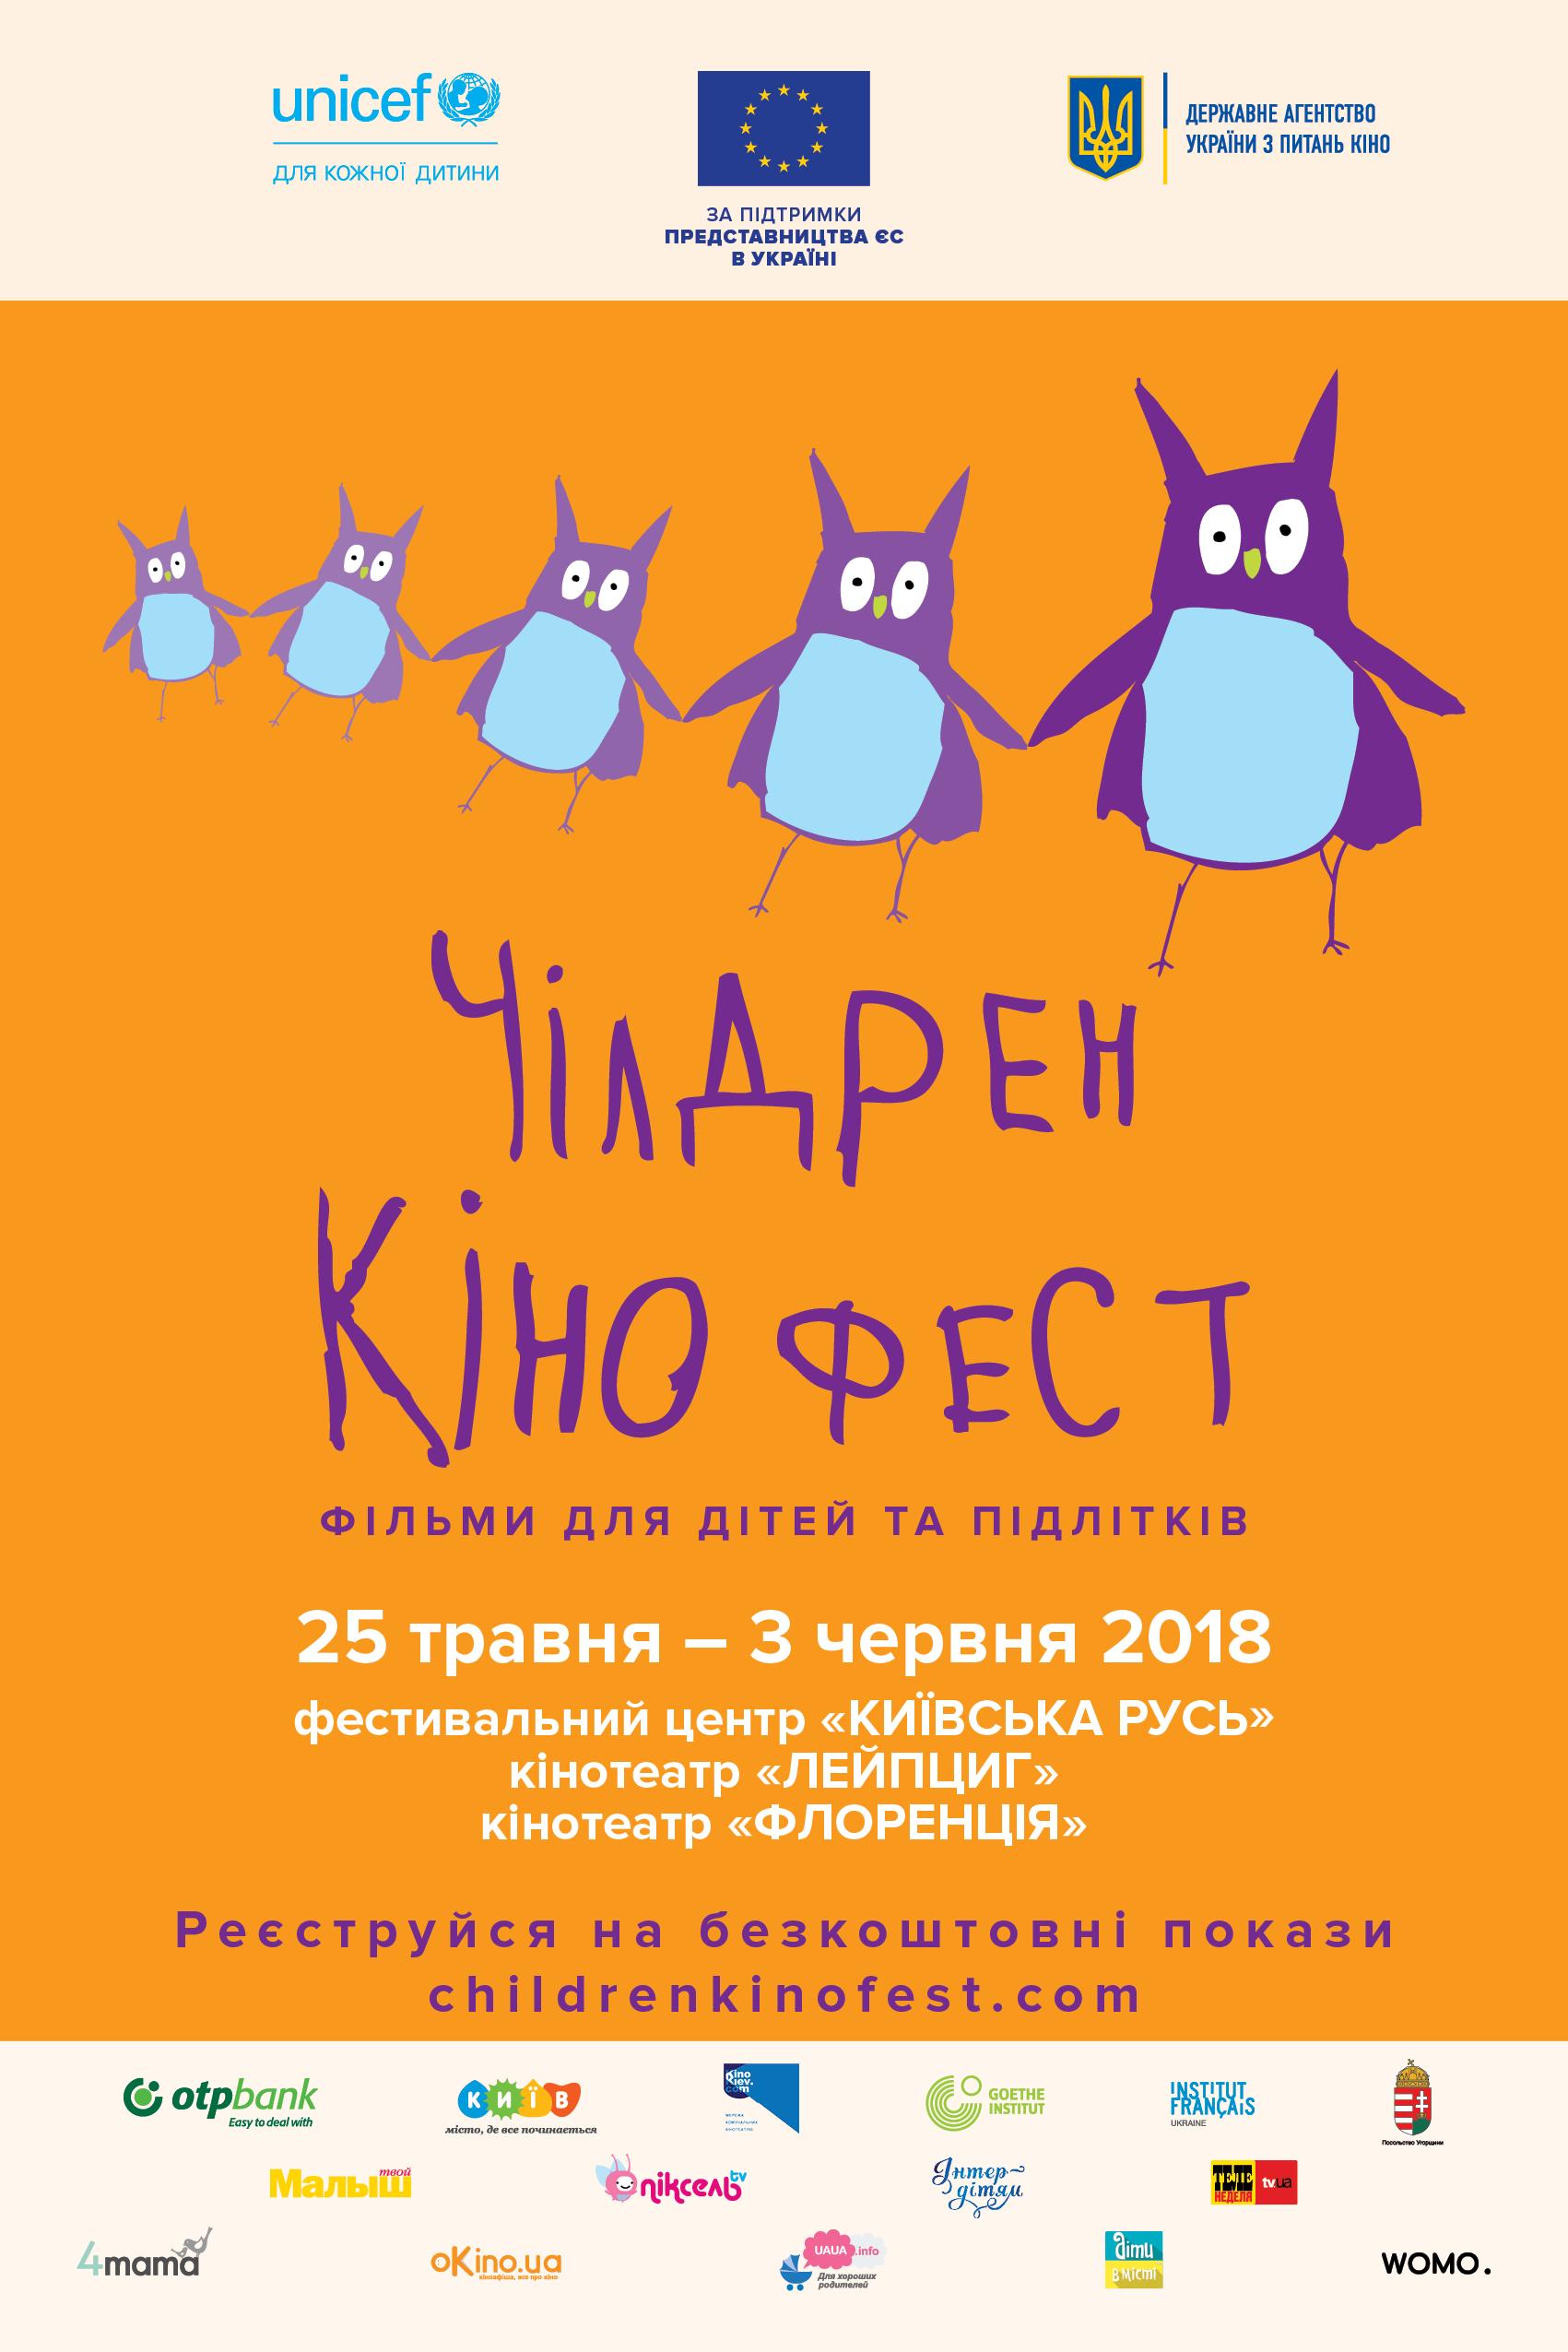 v-kieve-projdet-jubilejnyj-festival-children-kinofest-5